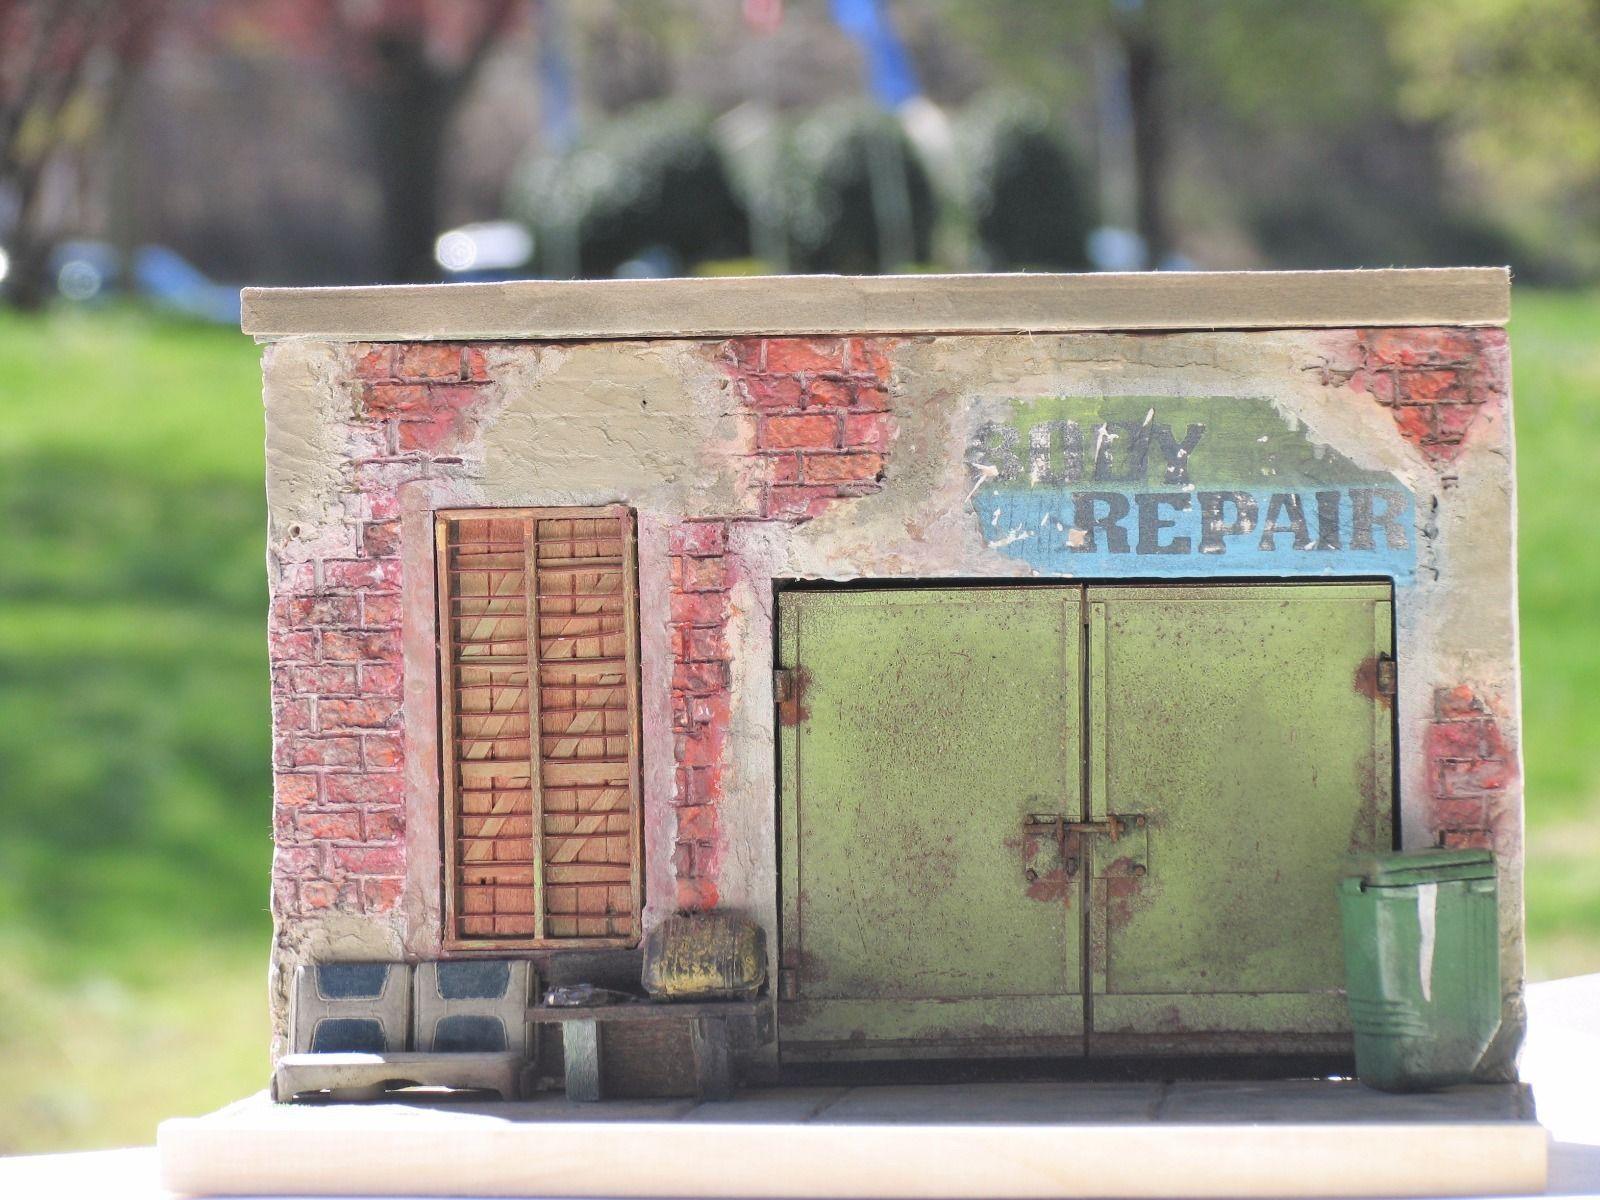 1 24 1 25 Barn Garage Diorama For Sale On Ebay: 1/25 1/24 Garage Yard For Chevy Ford Dodge Truck Pickup